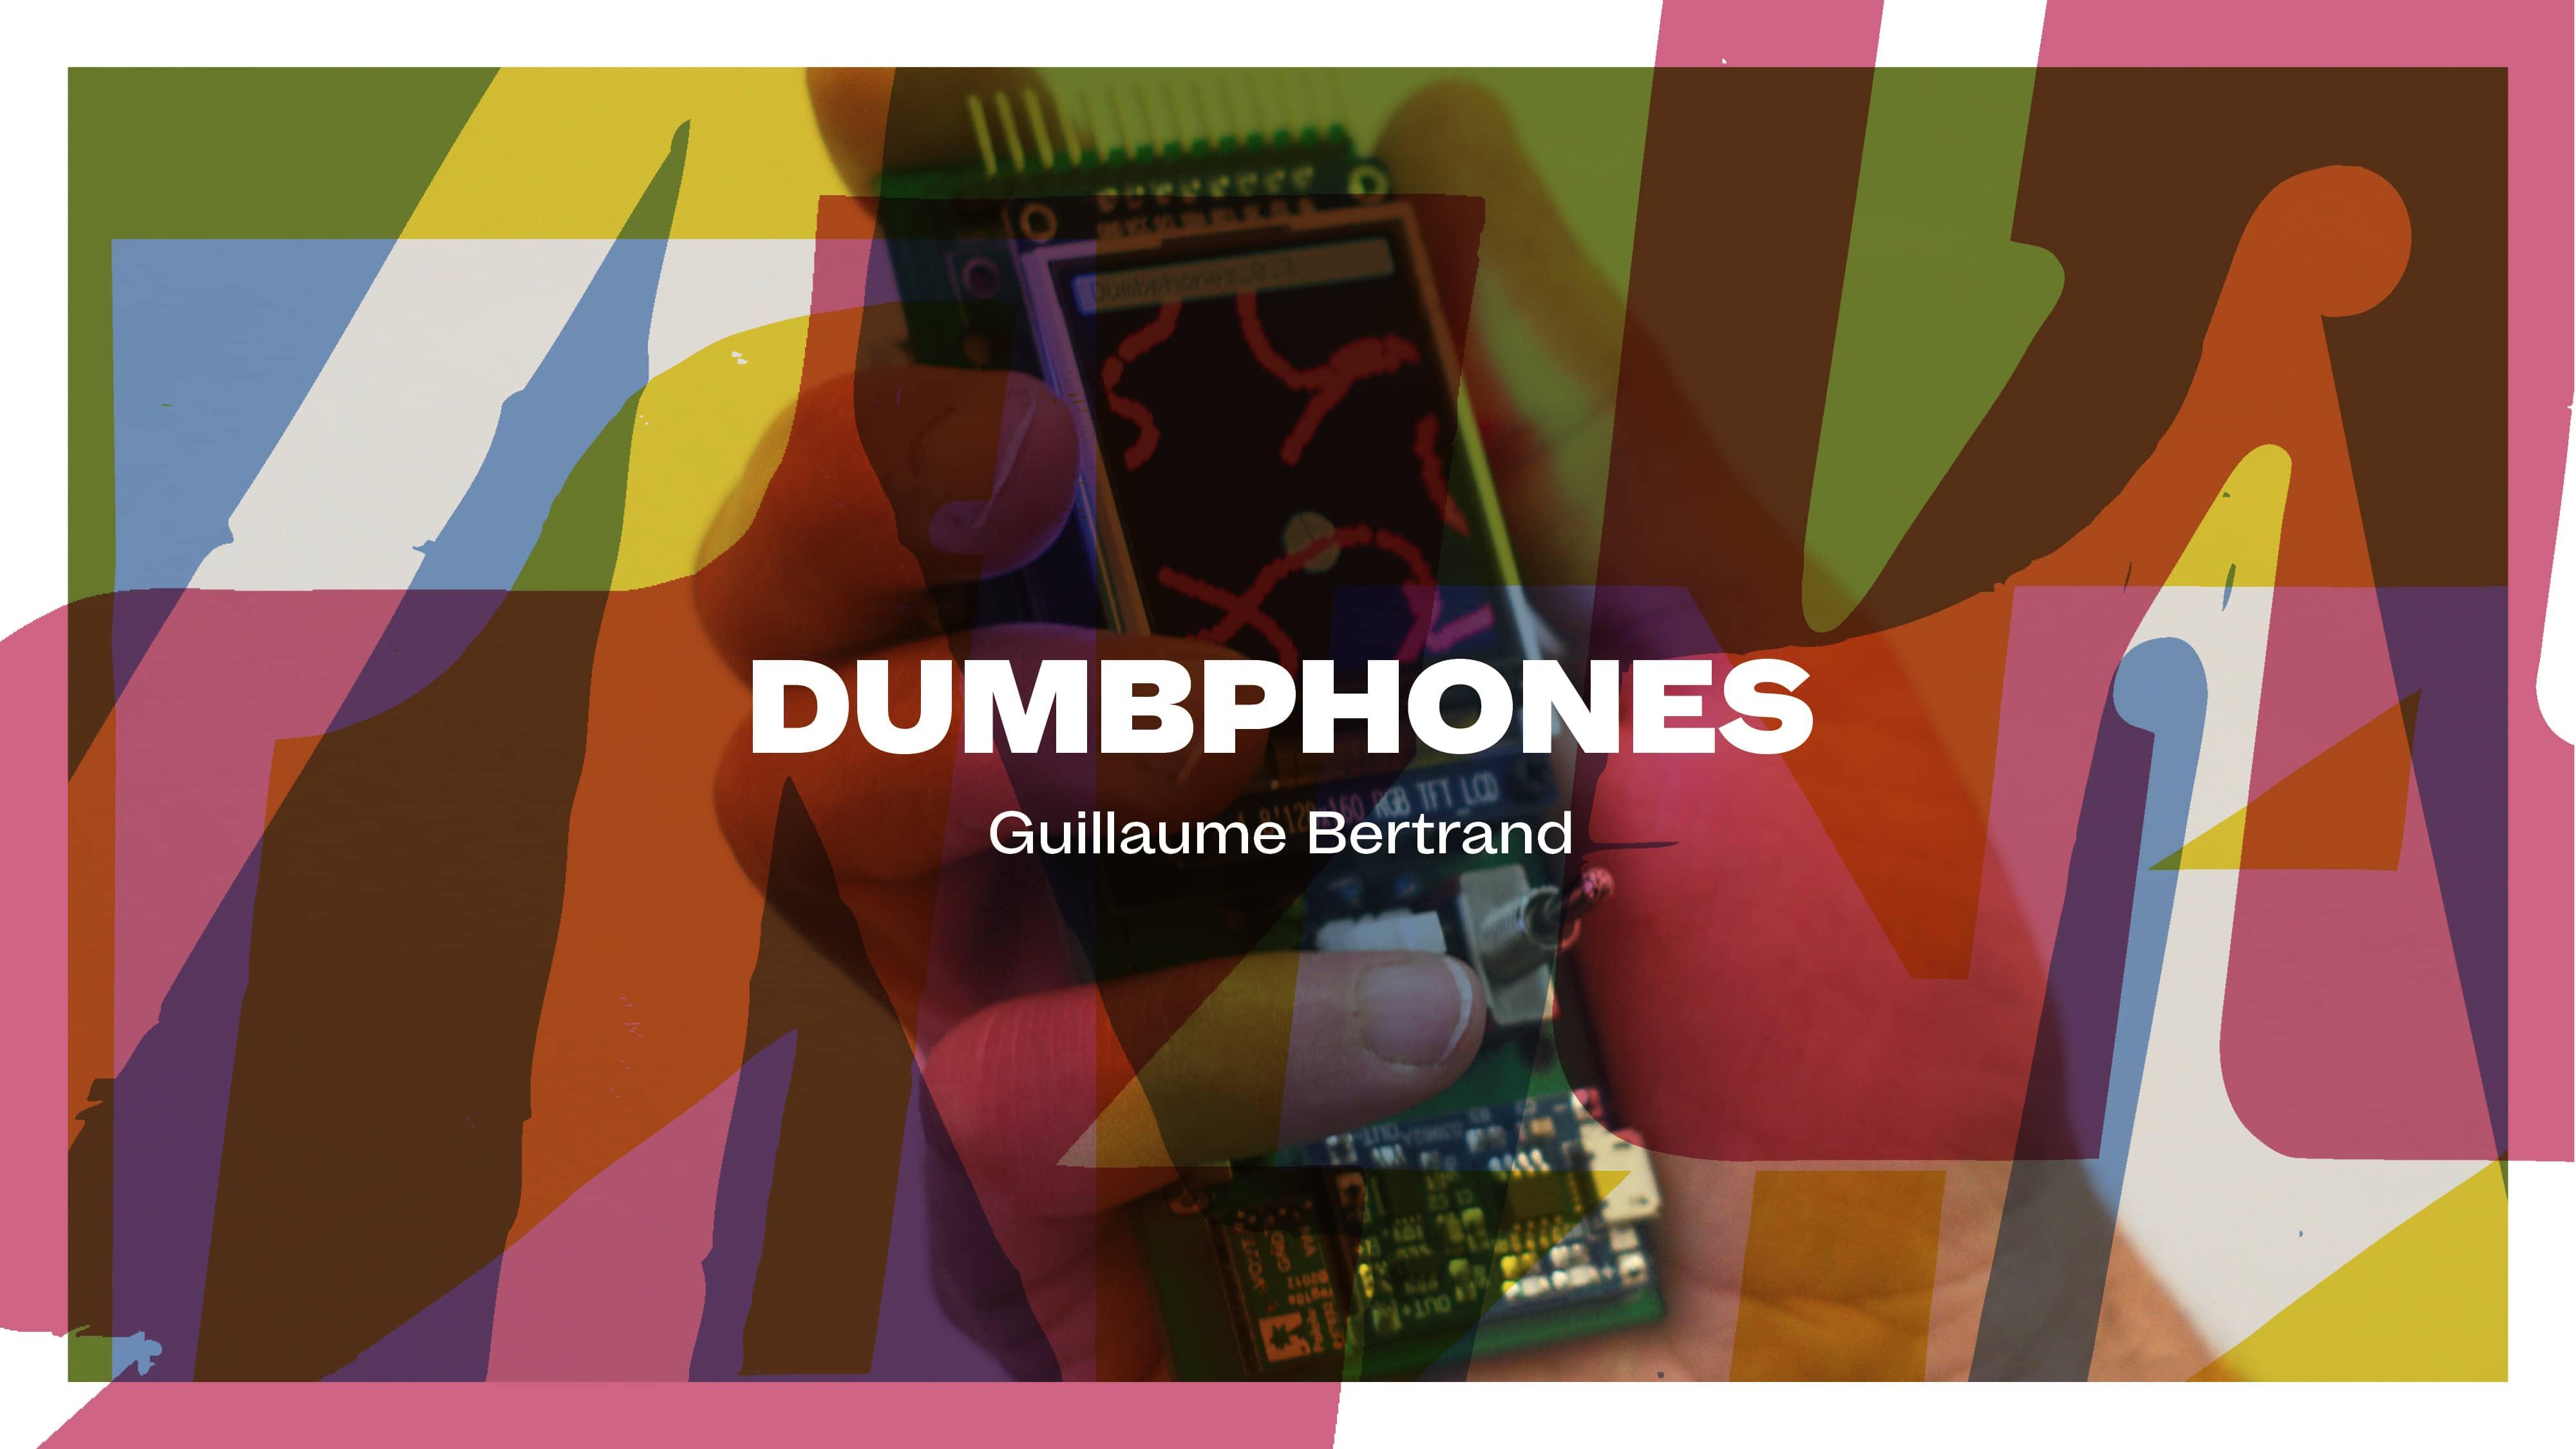 Dumbphones